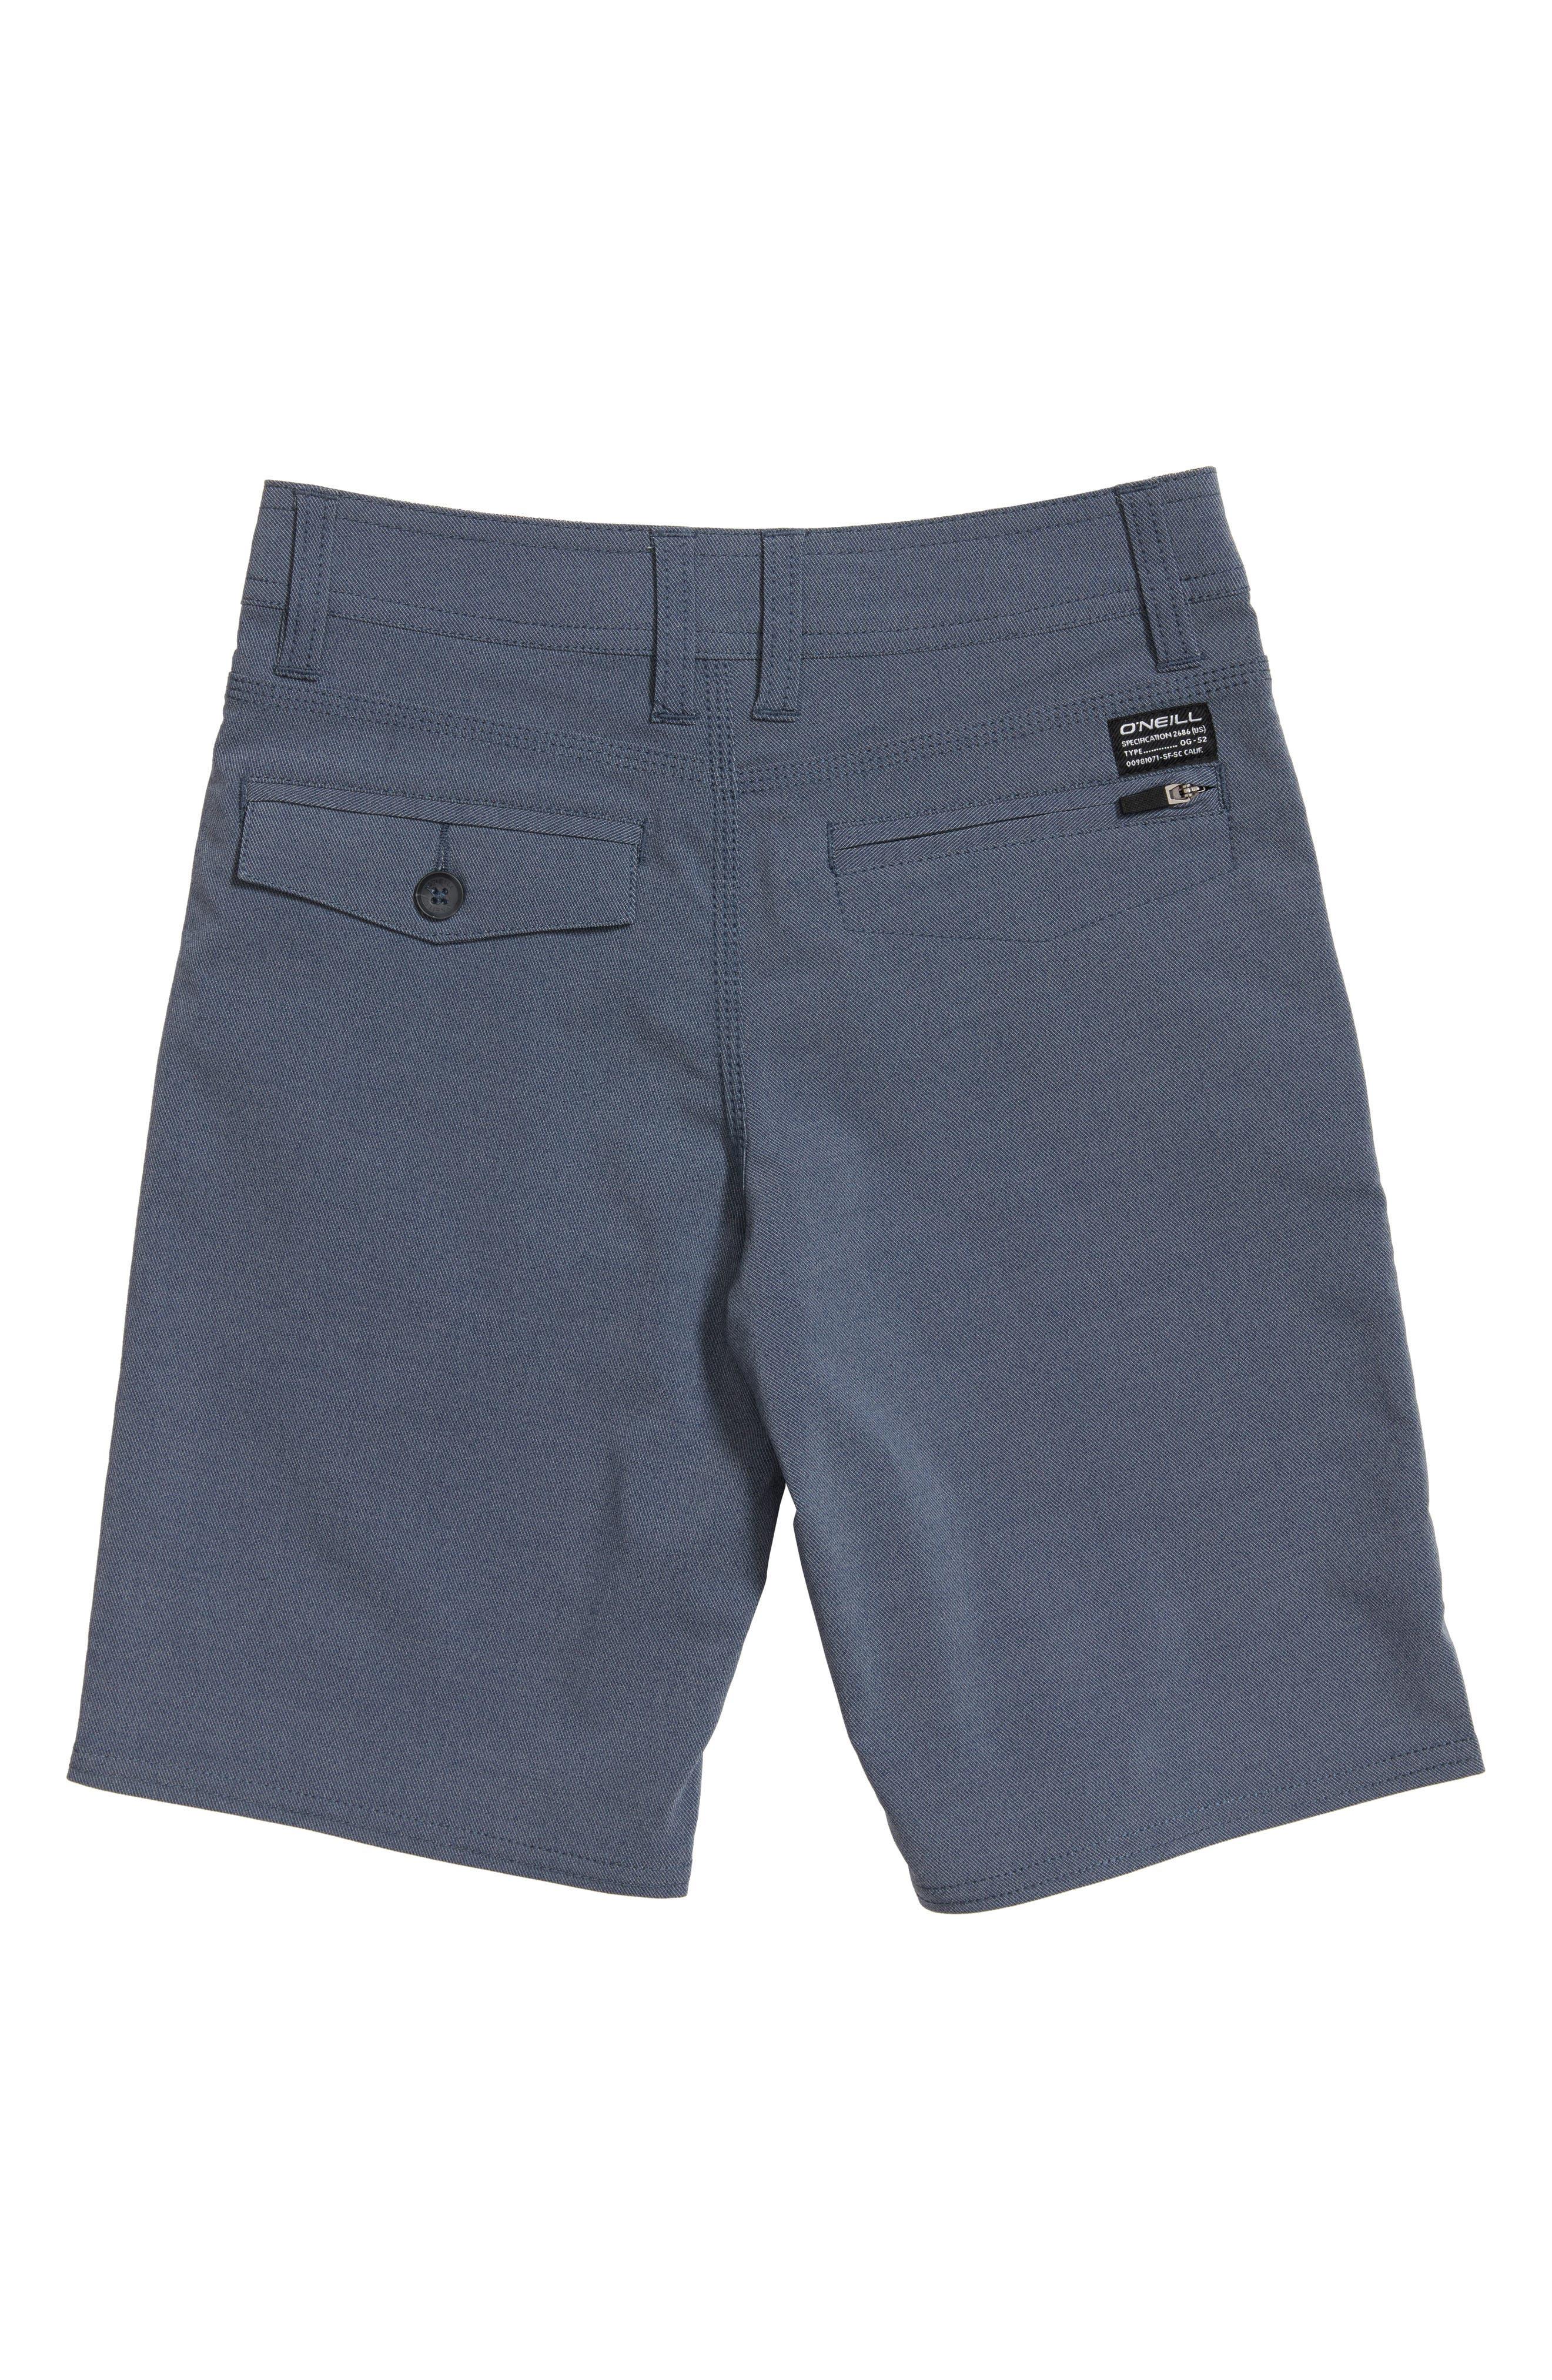 Stockton Hybrid Shorts,                             Alternate thumbnail 2, color,                             Navy